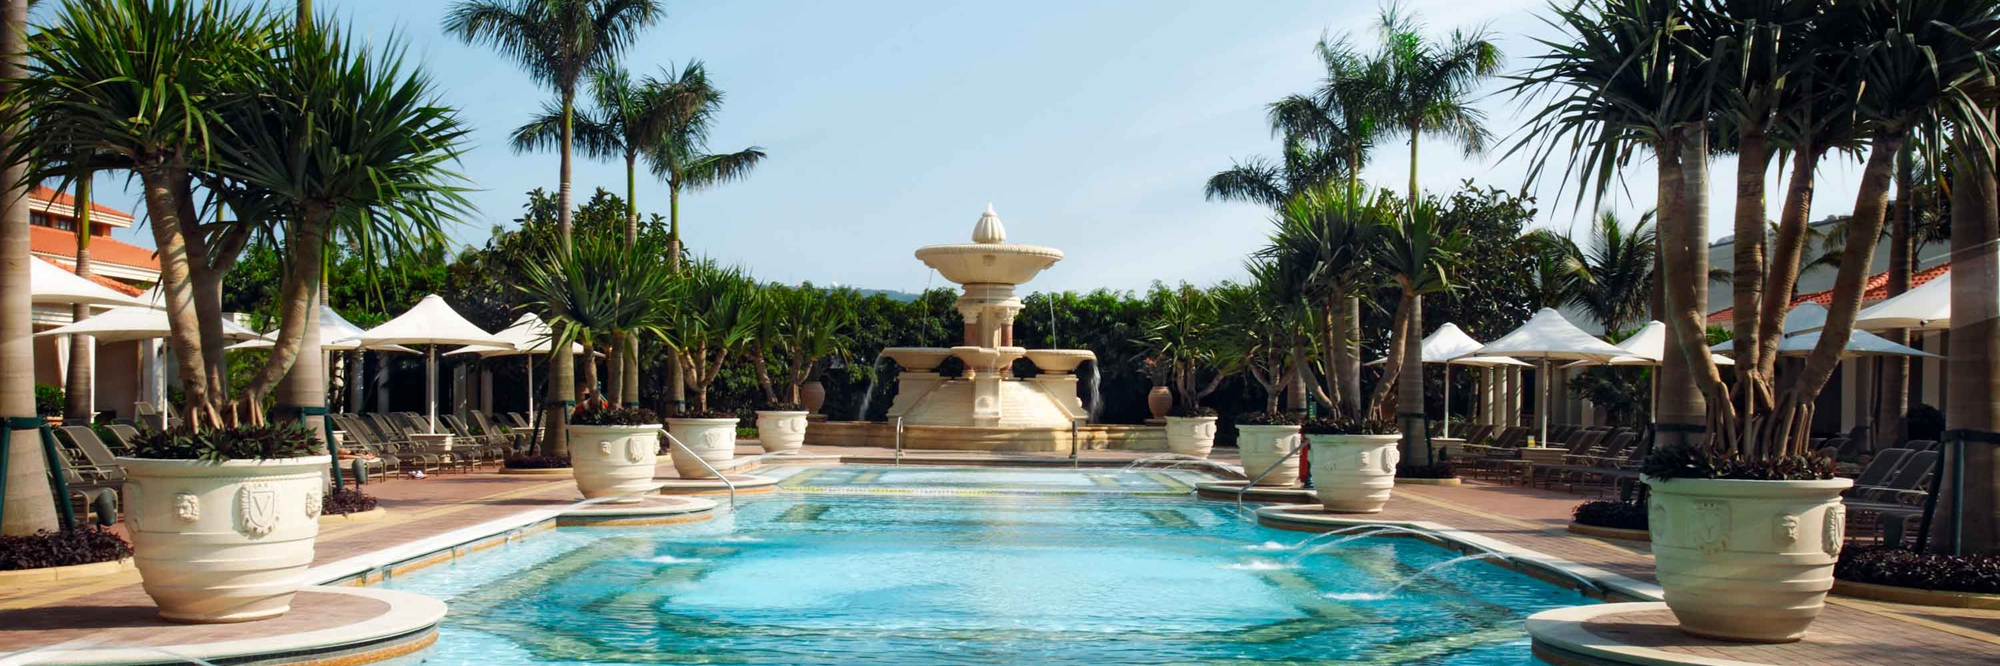 Macau Venetian pool